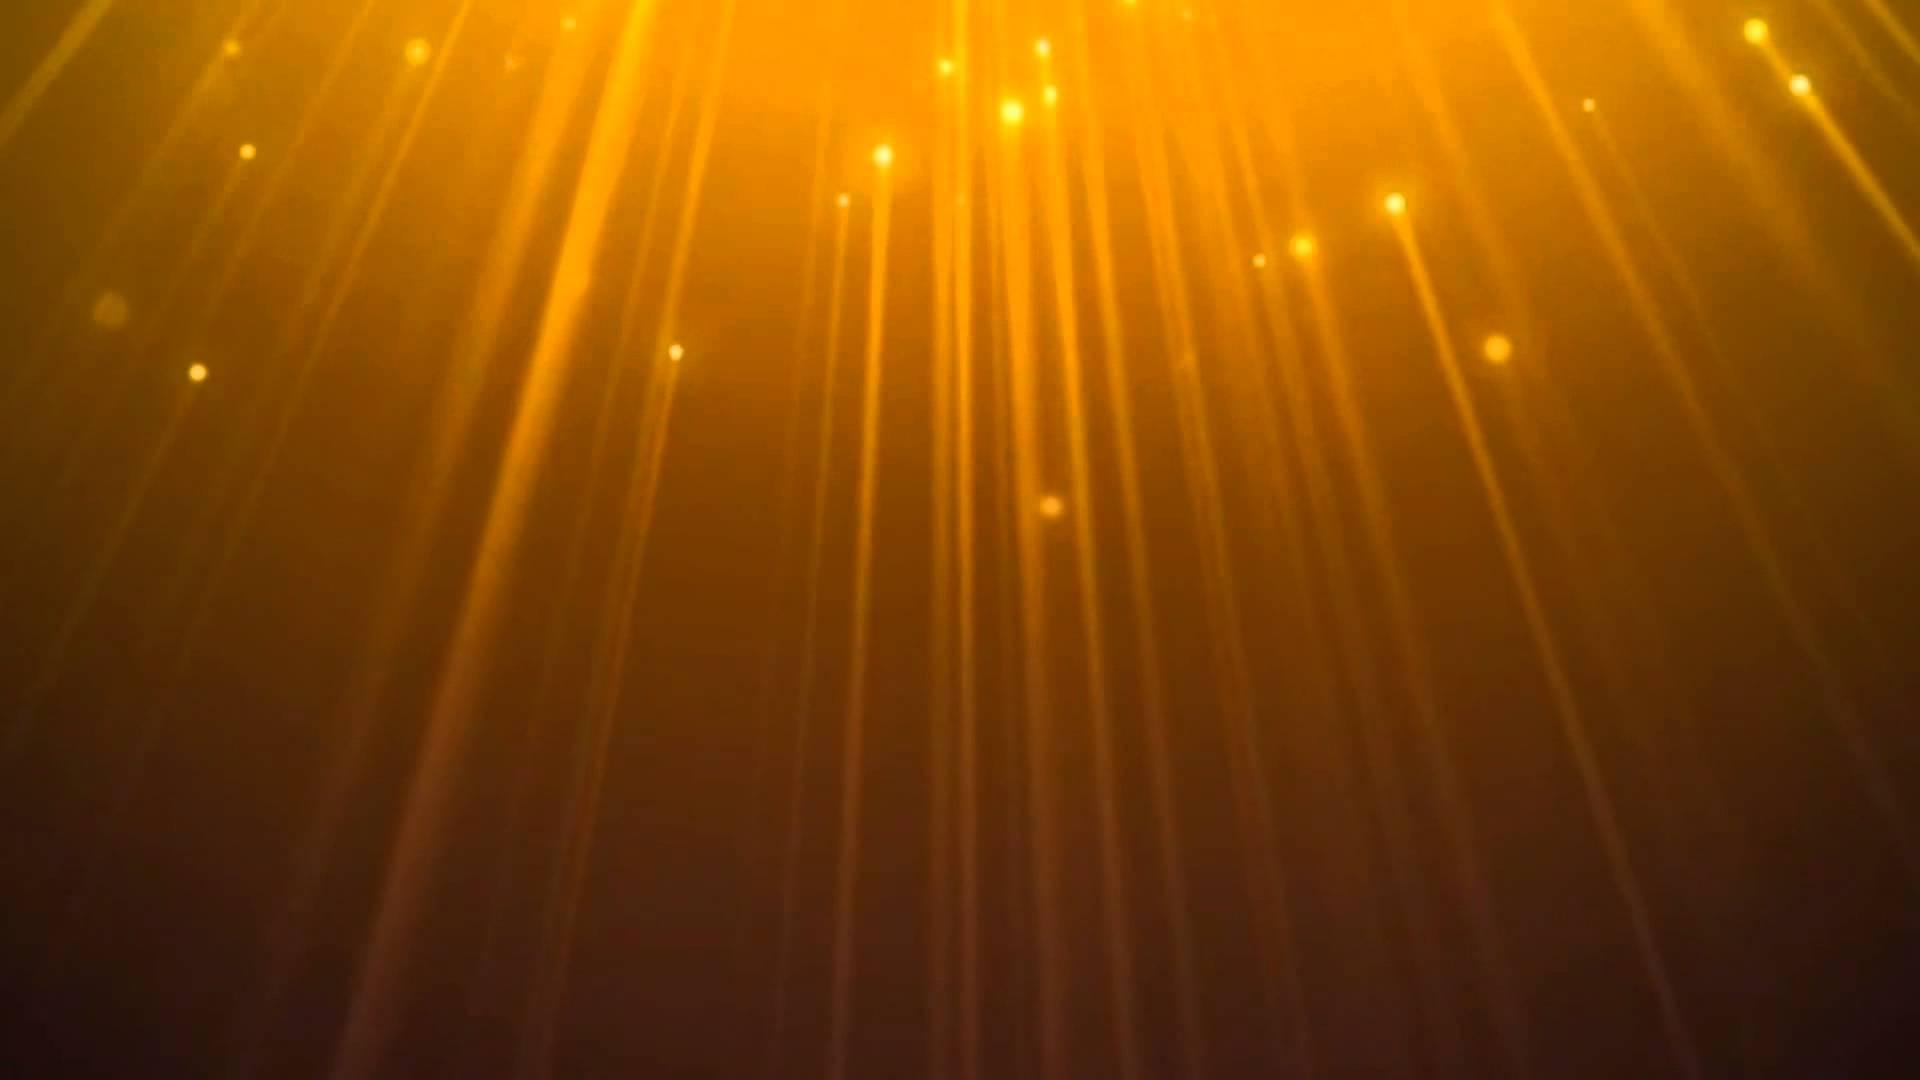 Orange Sparkle   Creative Commons motion background video 1080p 1920x1080